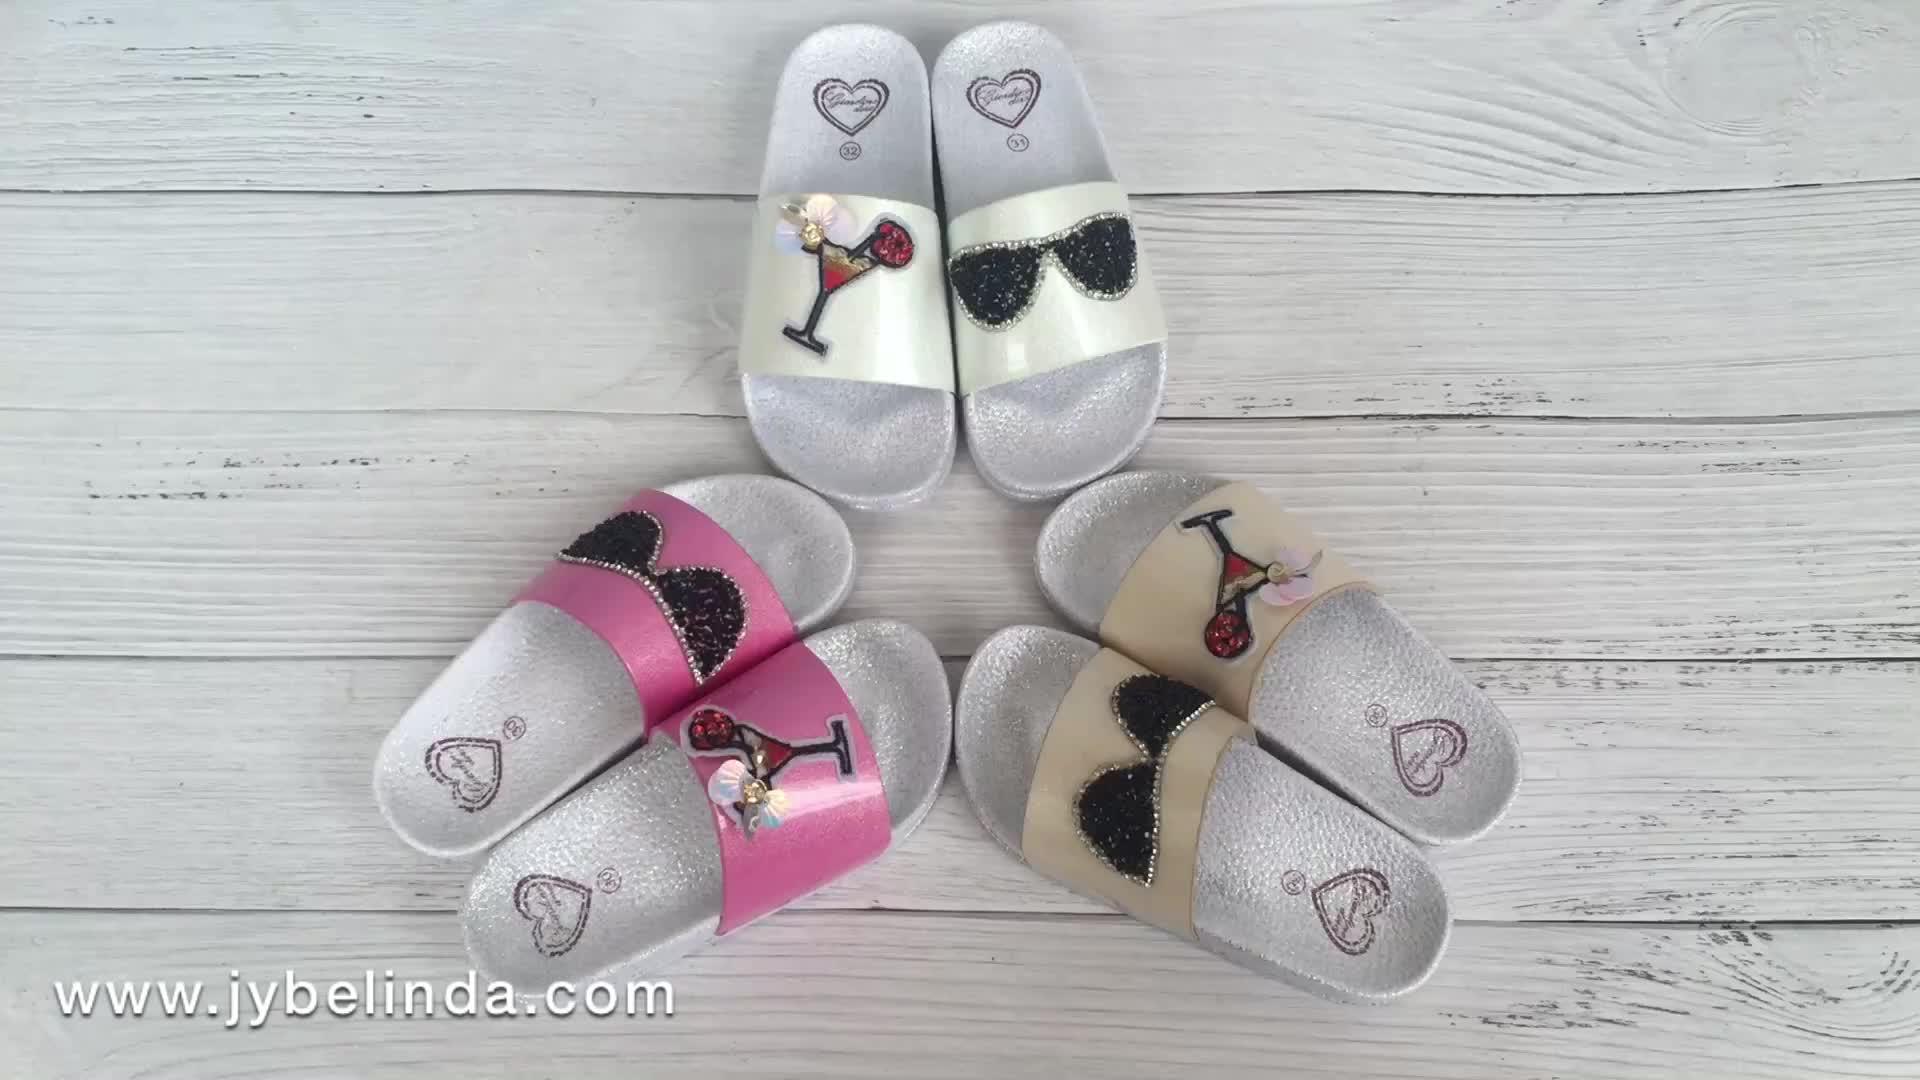 Kids Shoes Wholesale Fancy Beautiful Bling Slide Girls Slippers Children